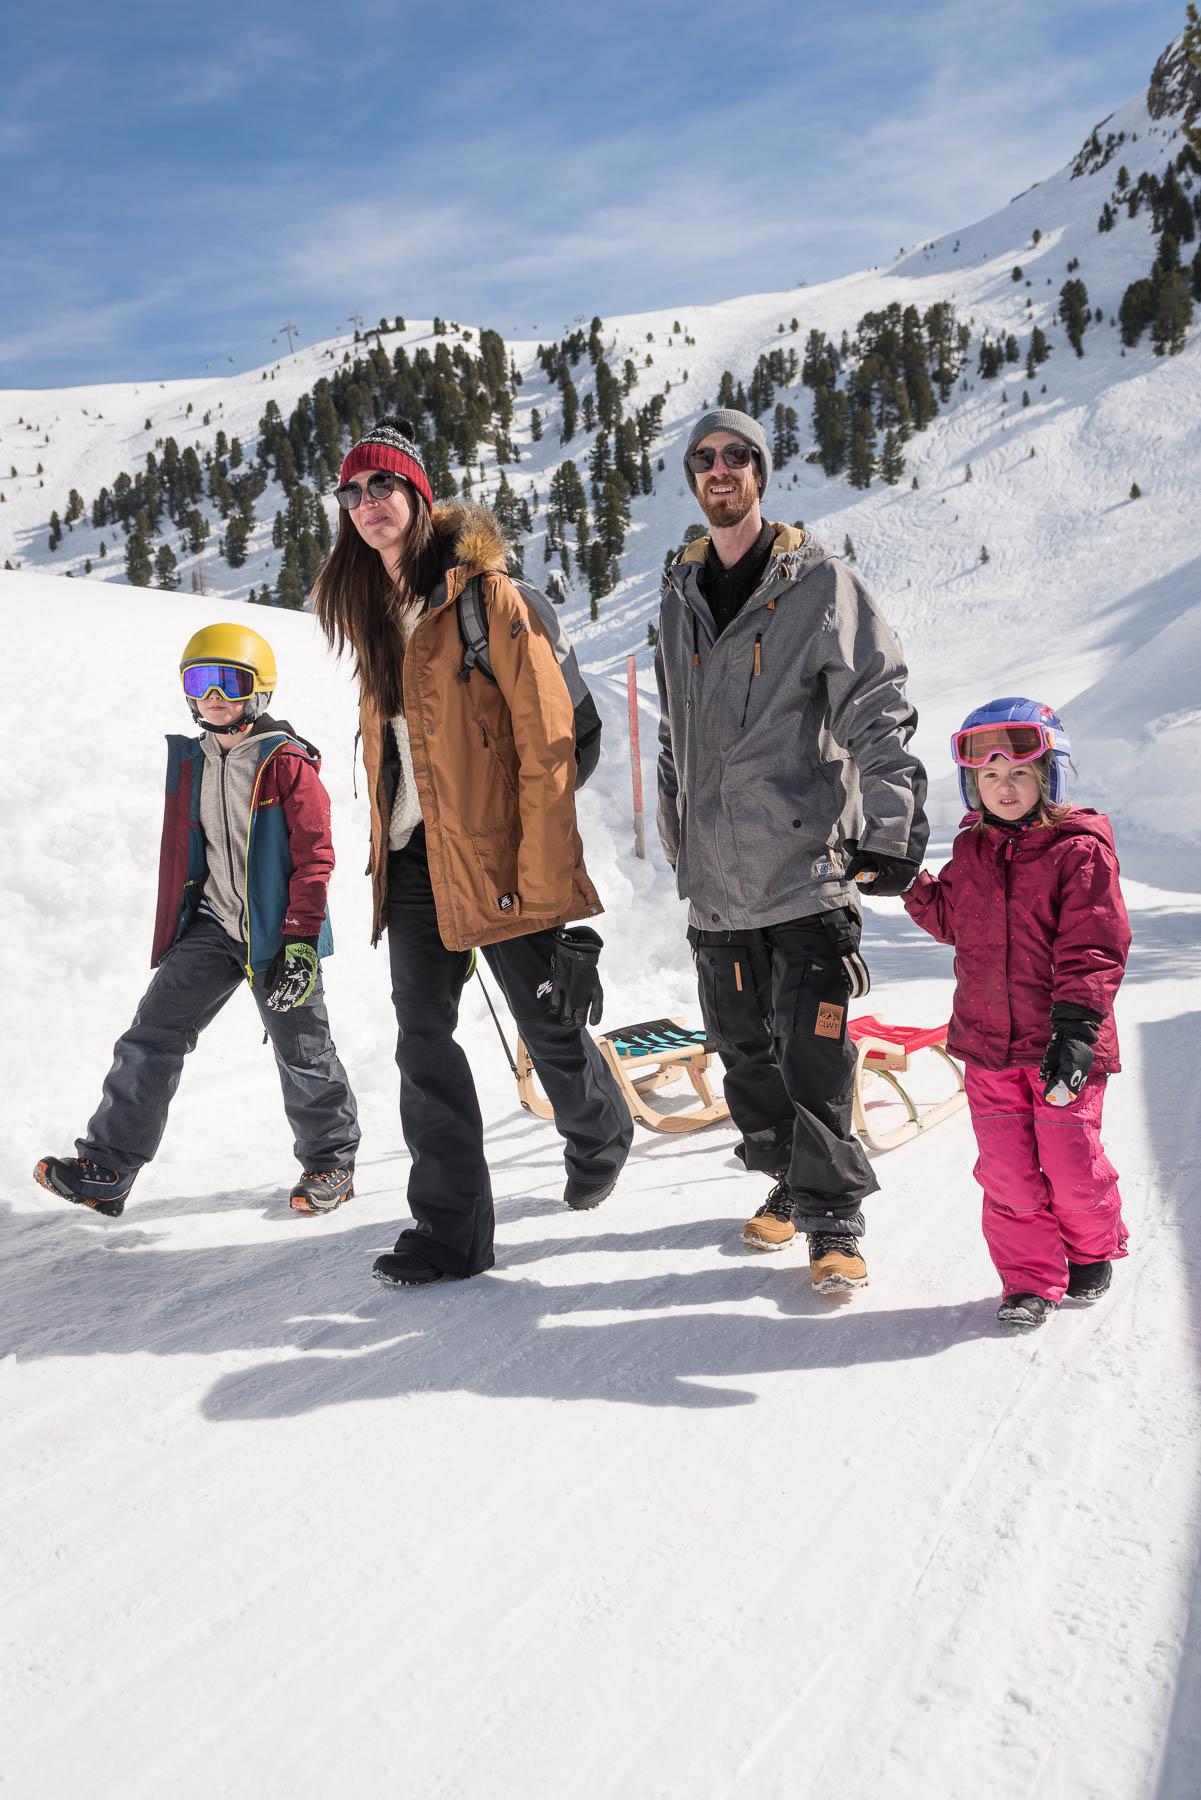 Alpina_Family_Day1_KlausPolzer_Preview03